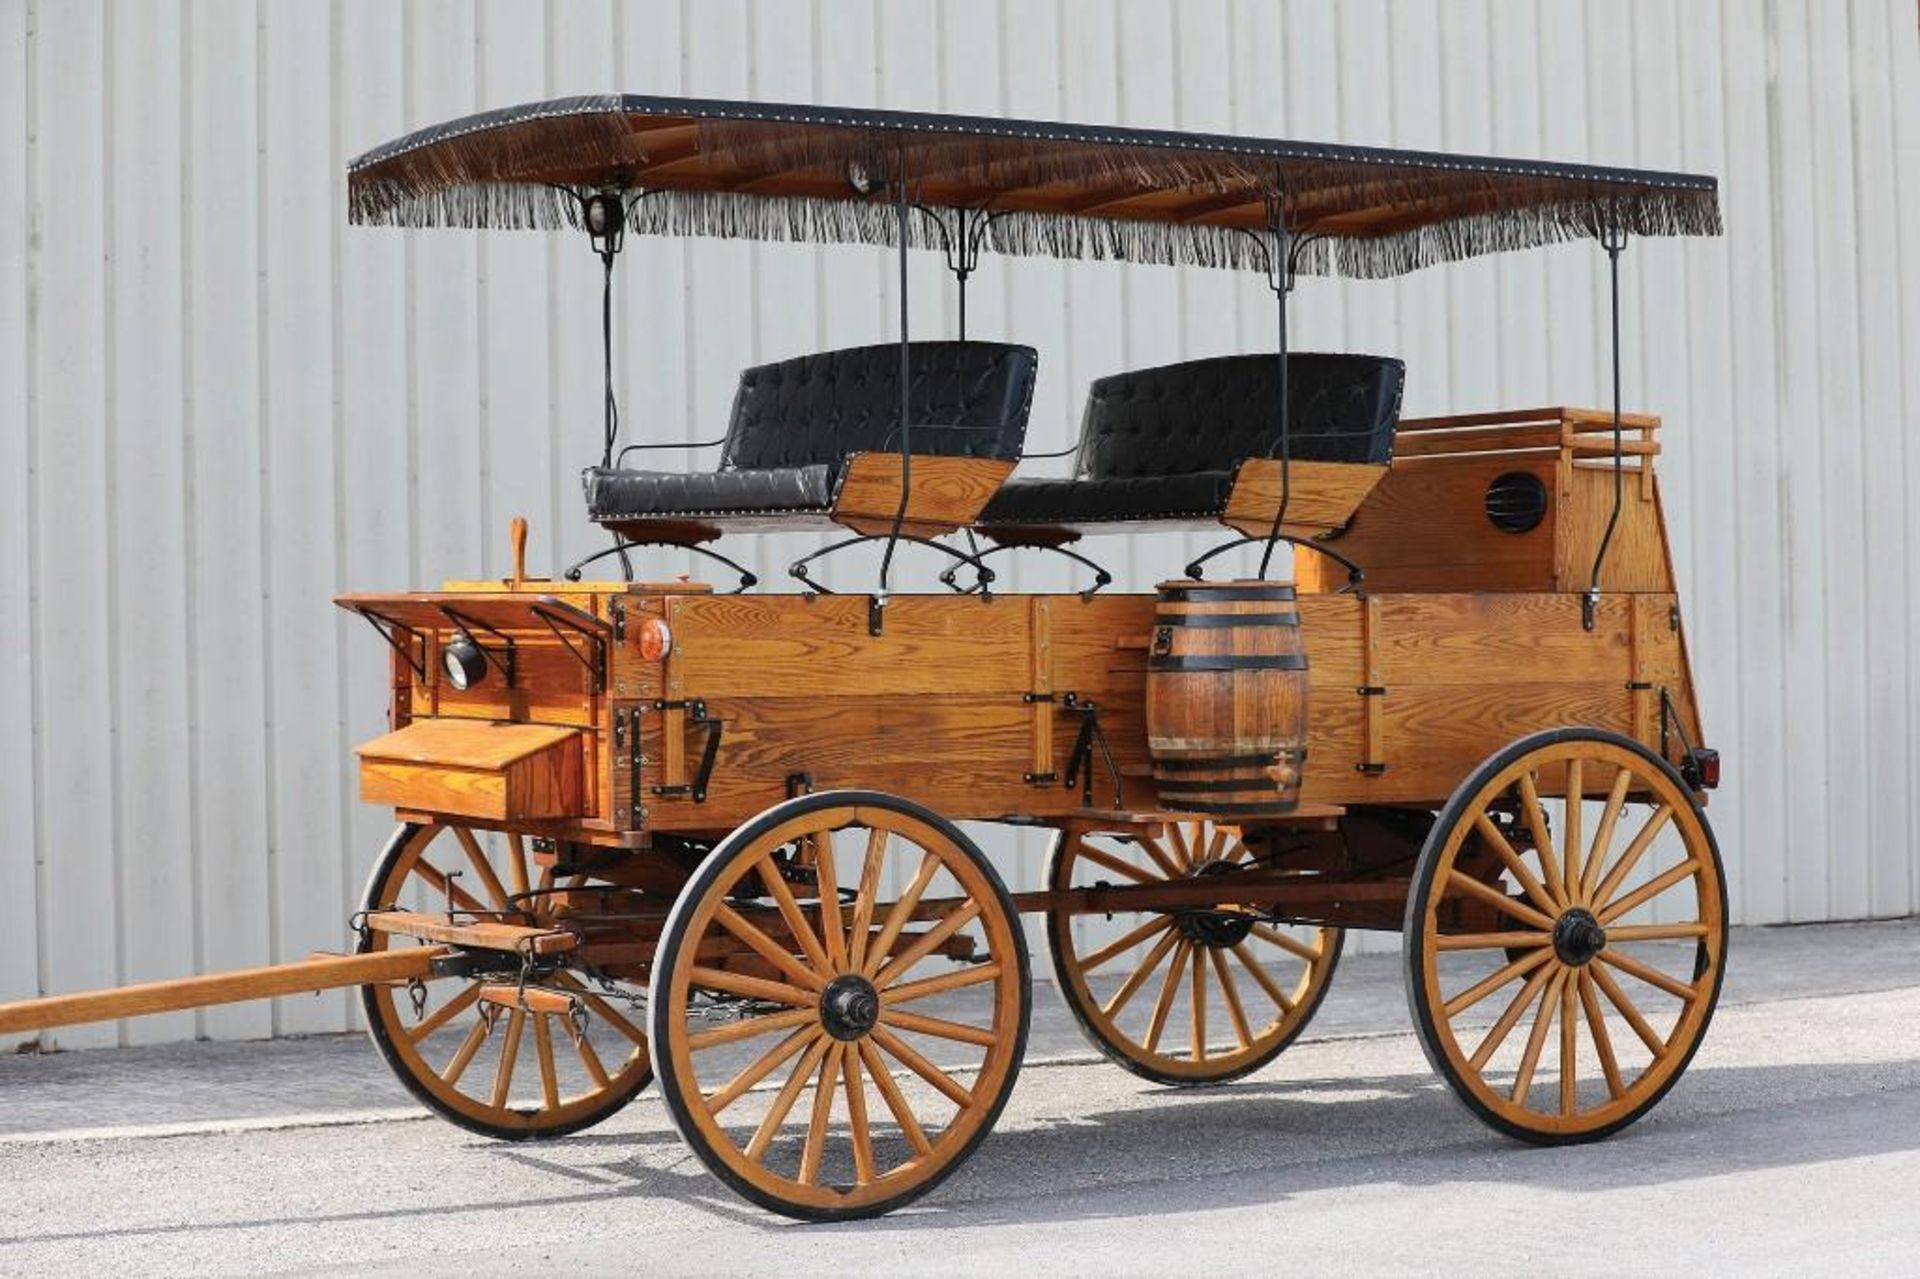 New Picnic Wagon, Fringe Top - Image 2 of 3